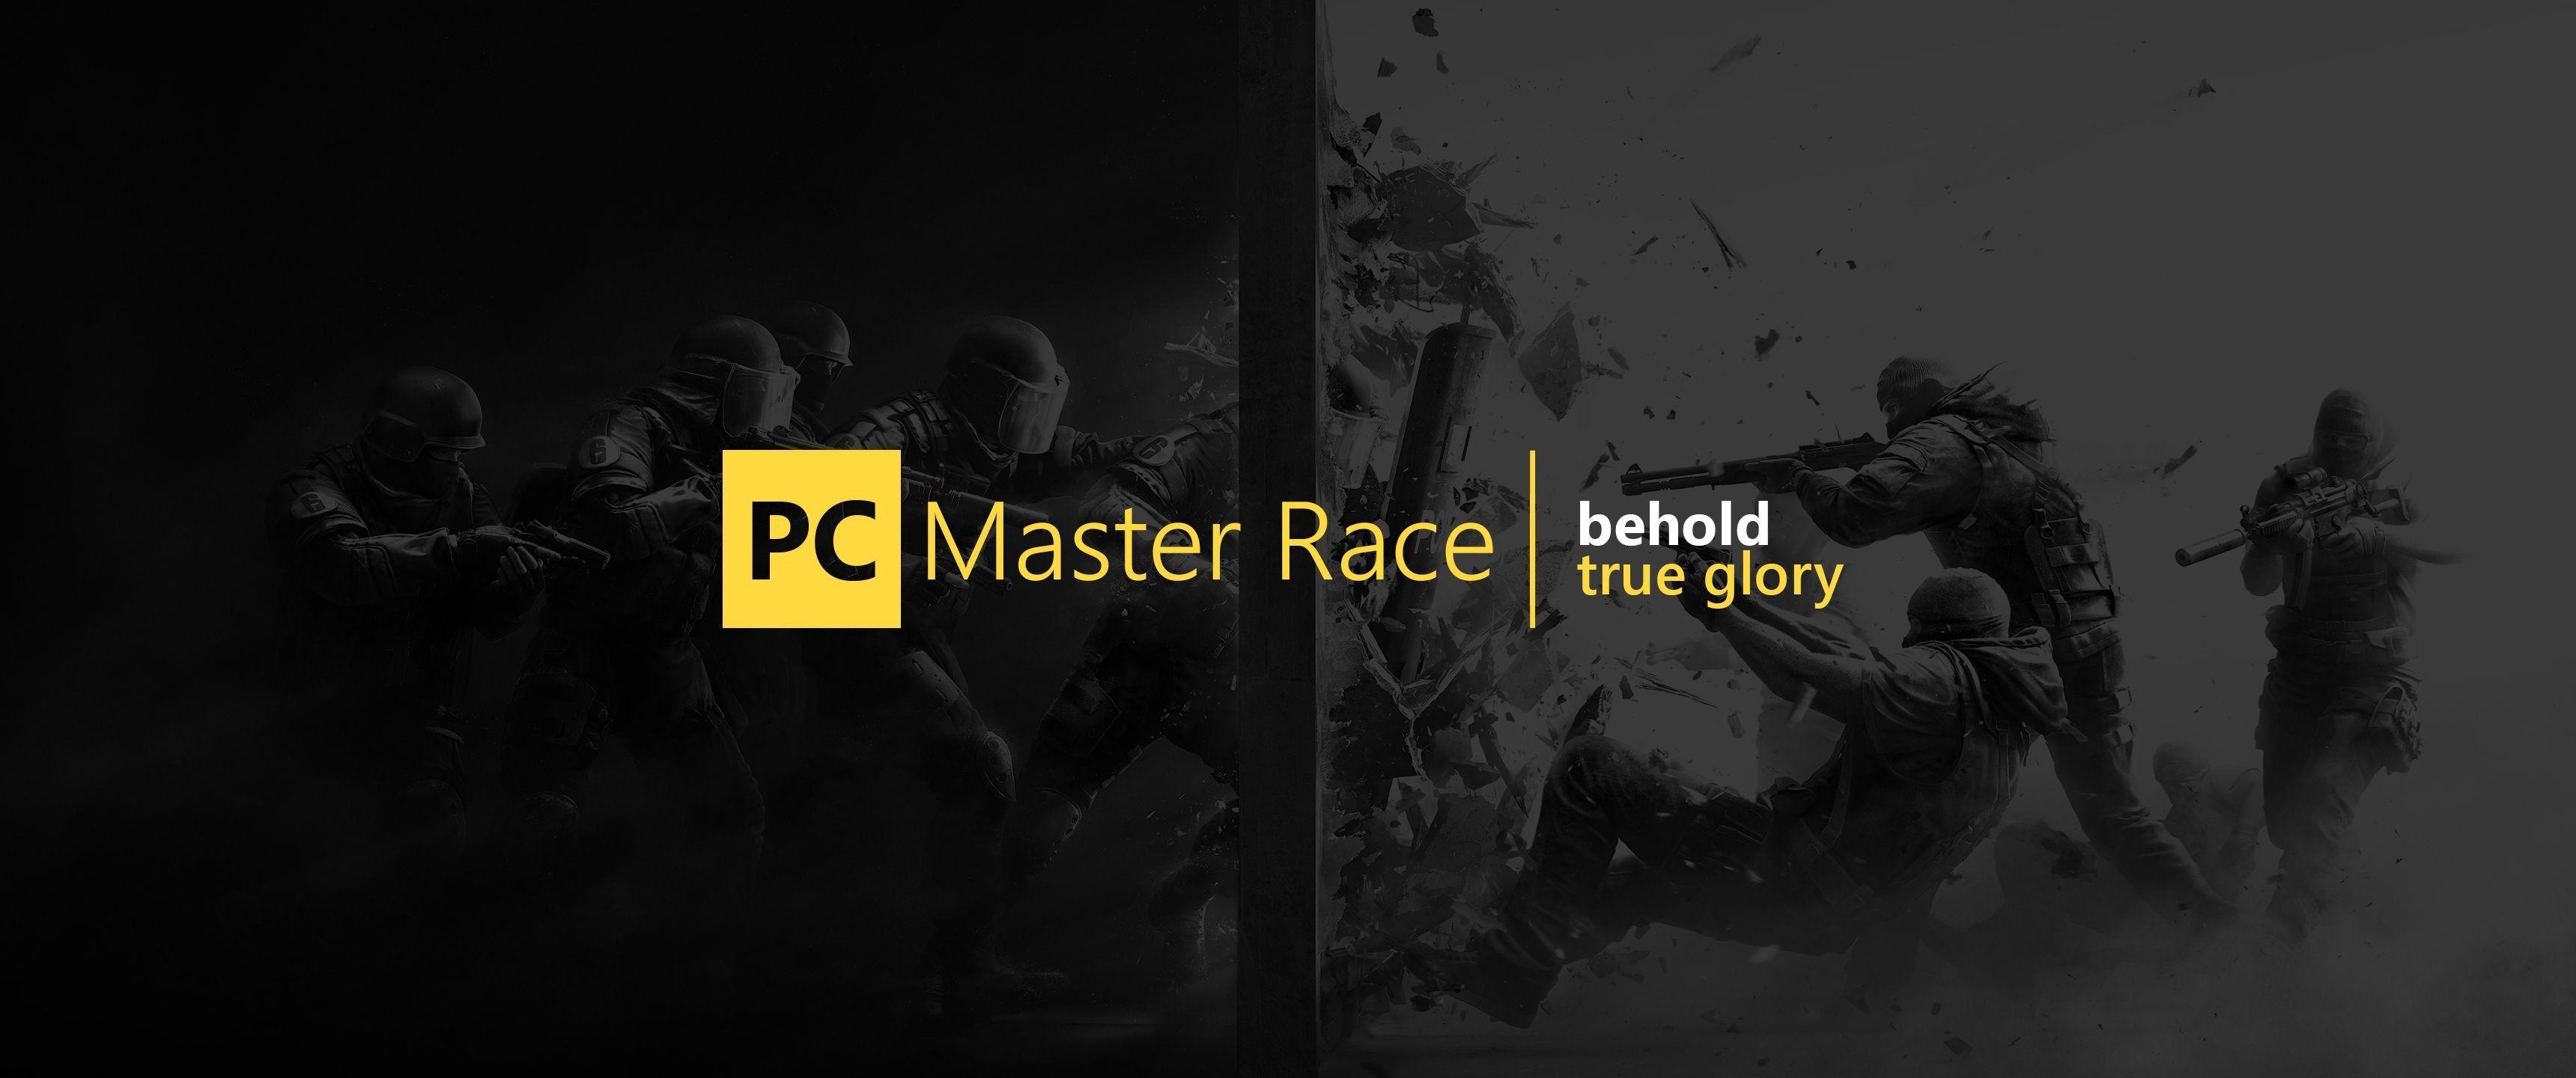 General PC gaming PC Master Race Rainbow Six: Siege